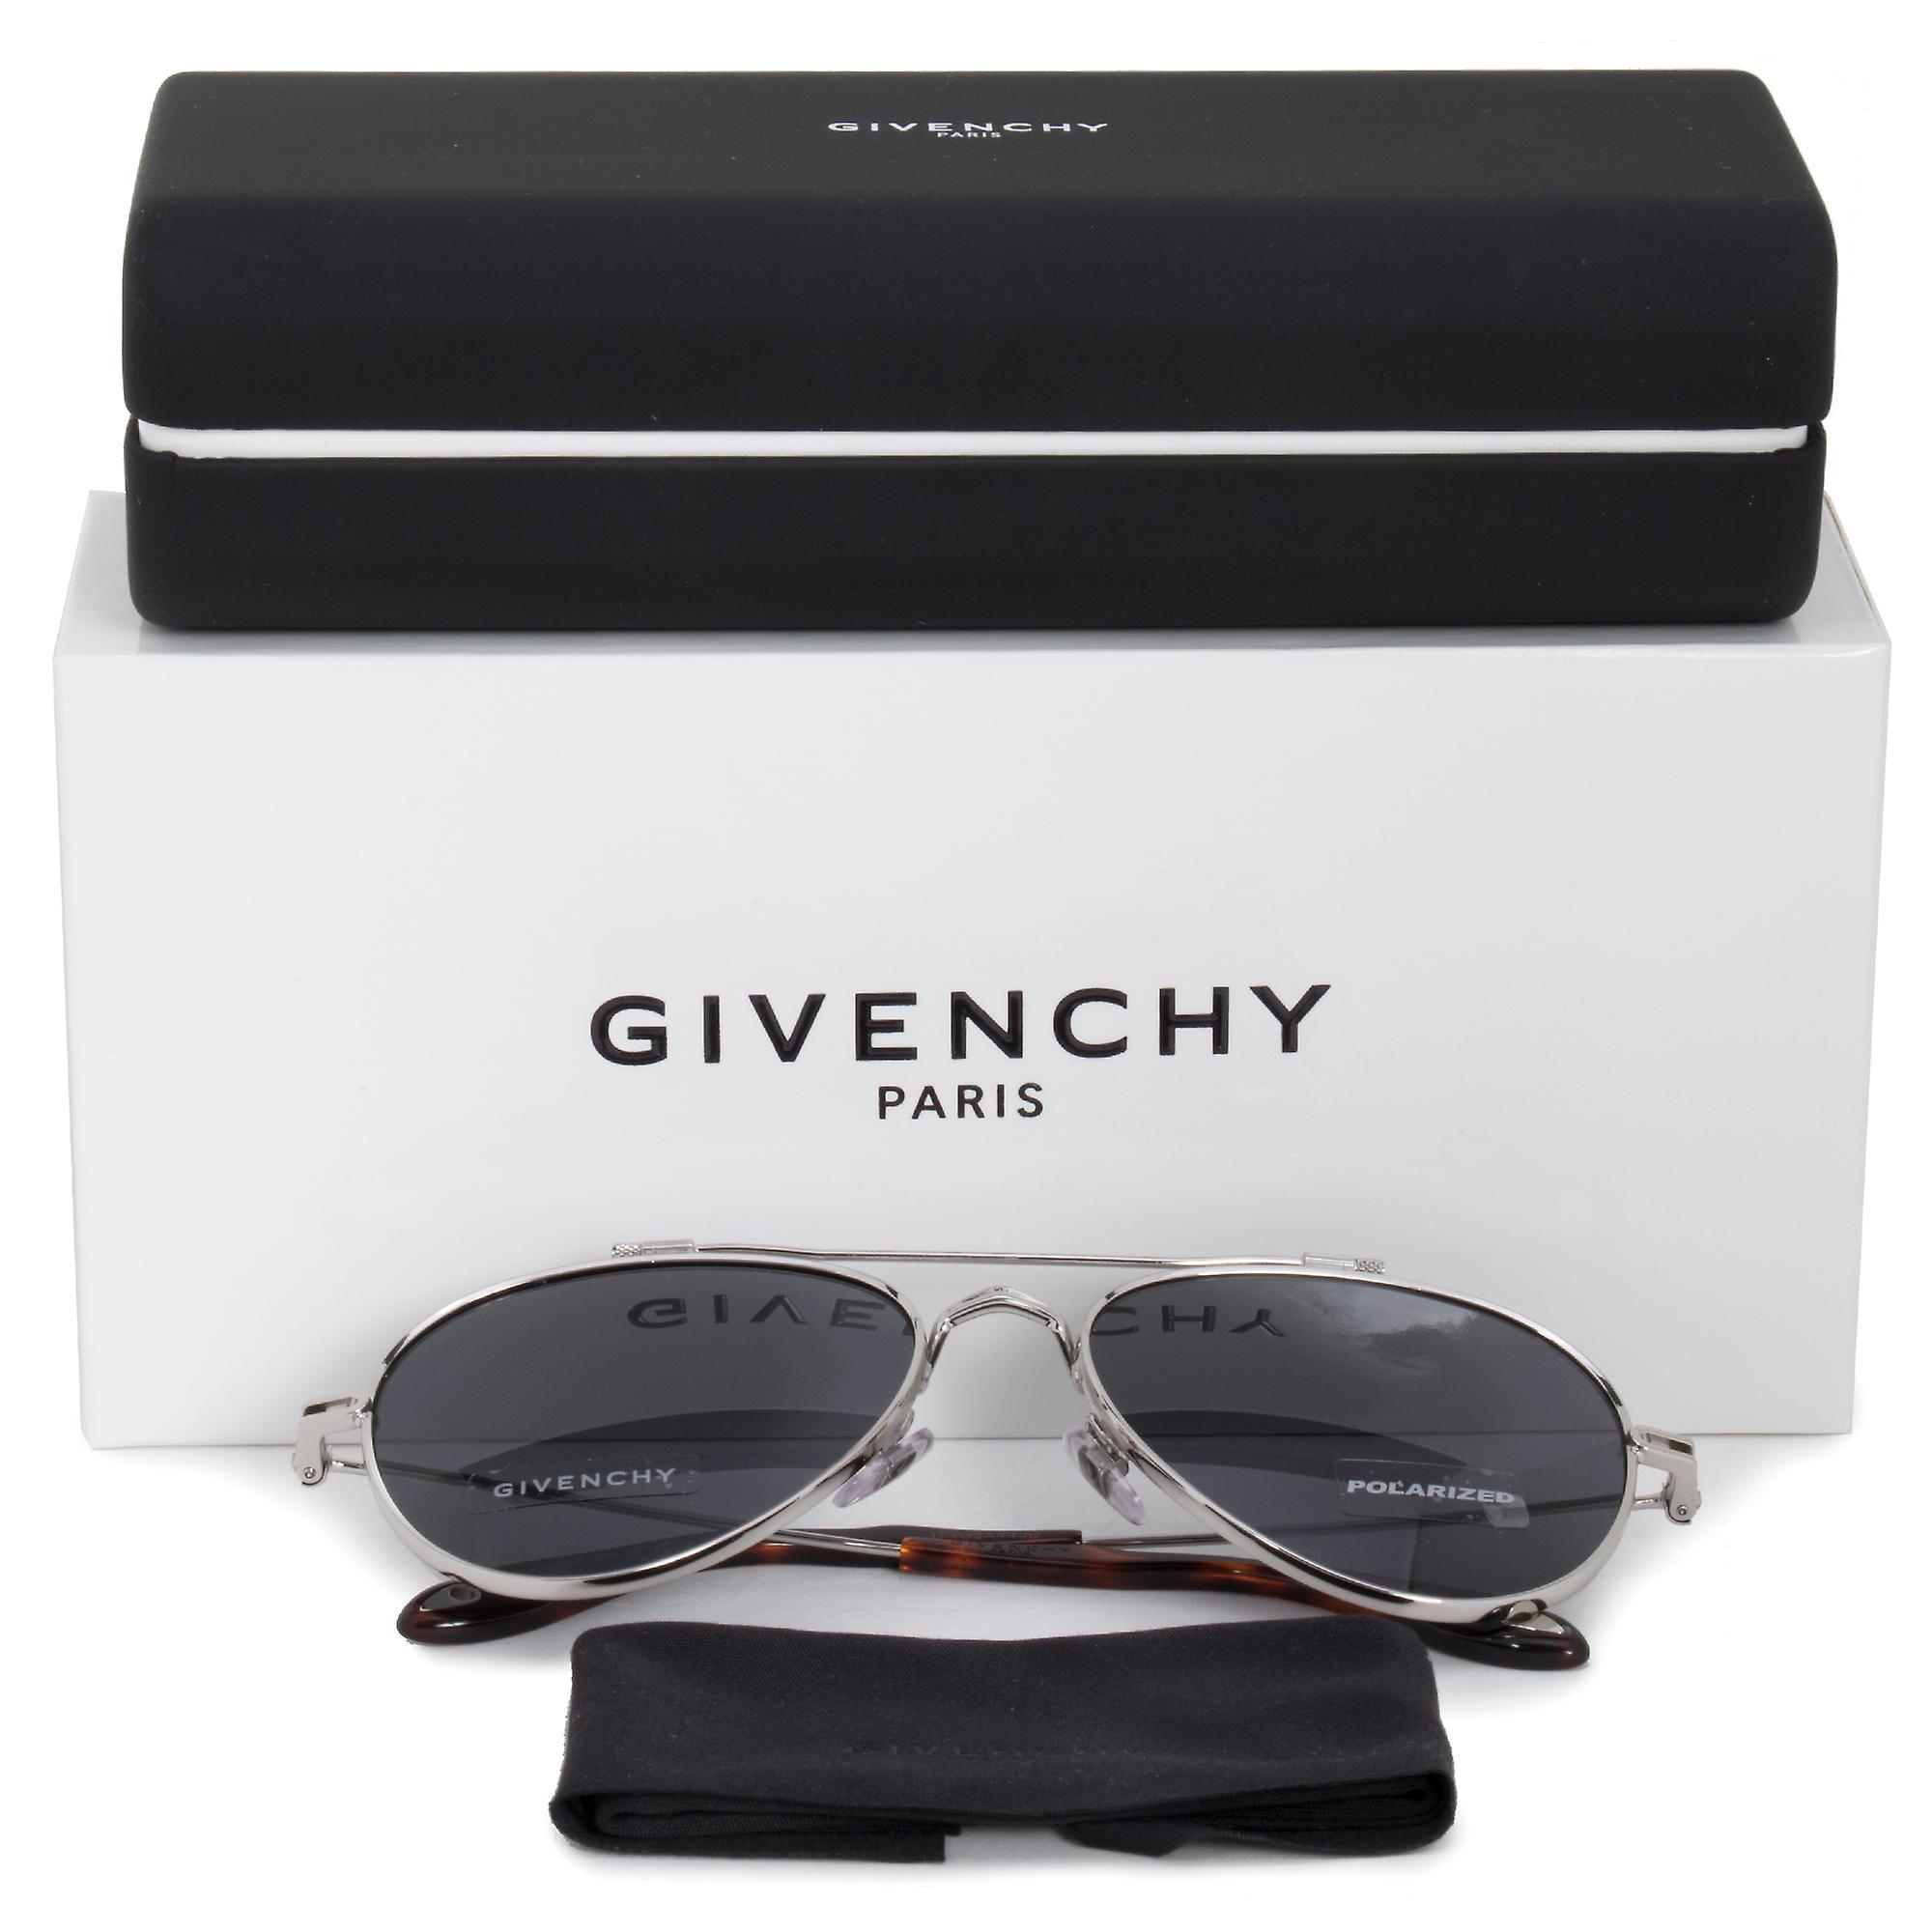 Givenchy Aviator Sunglasses GV7057/S 010/M9 58